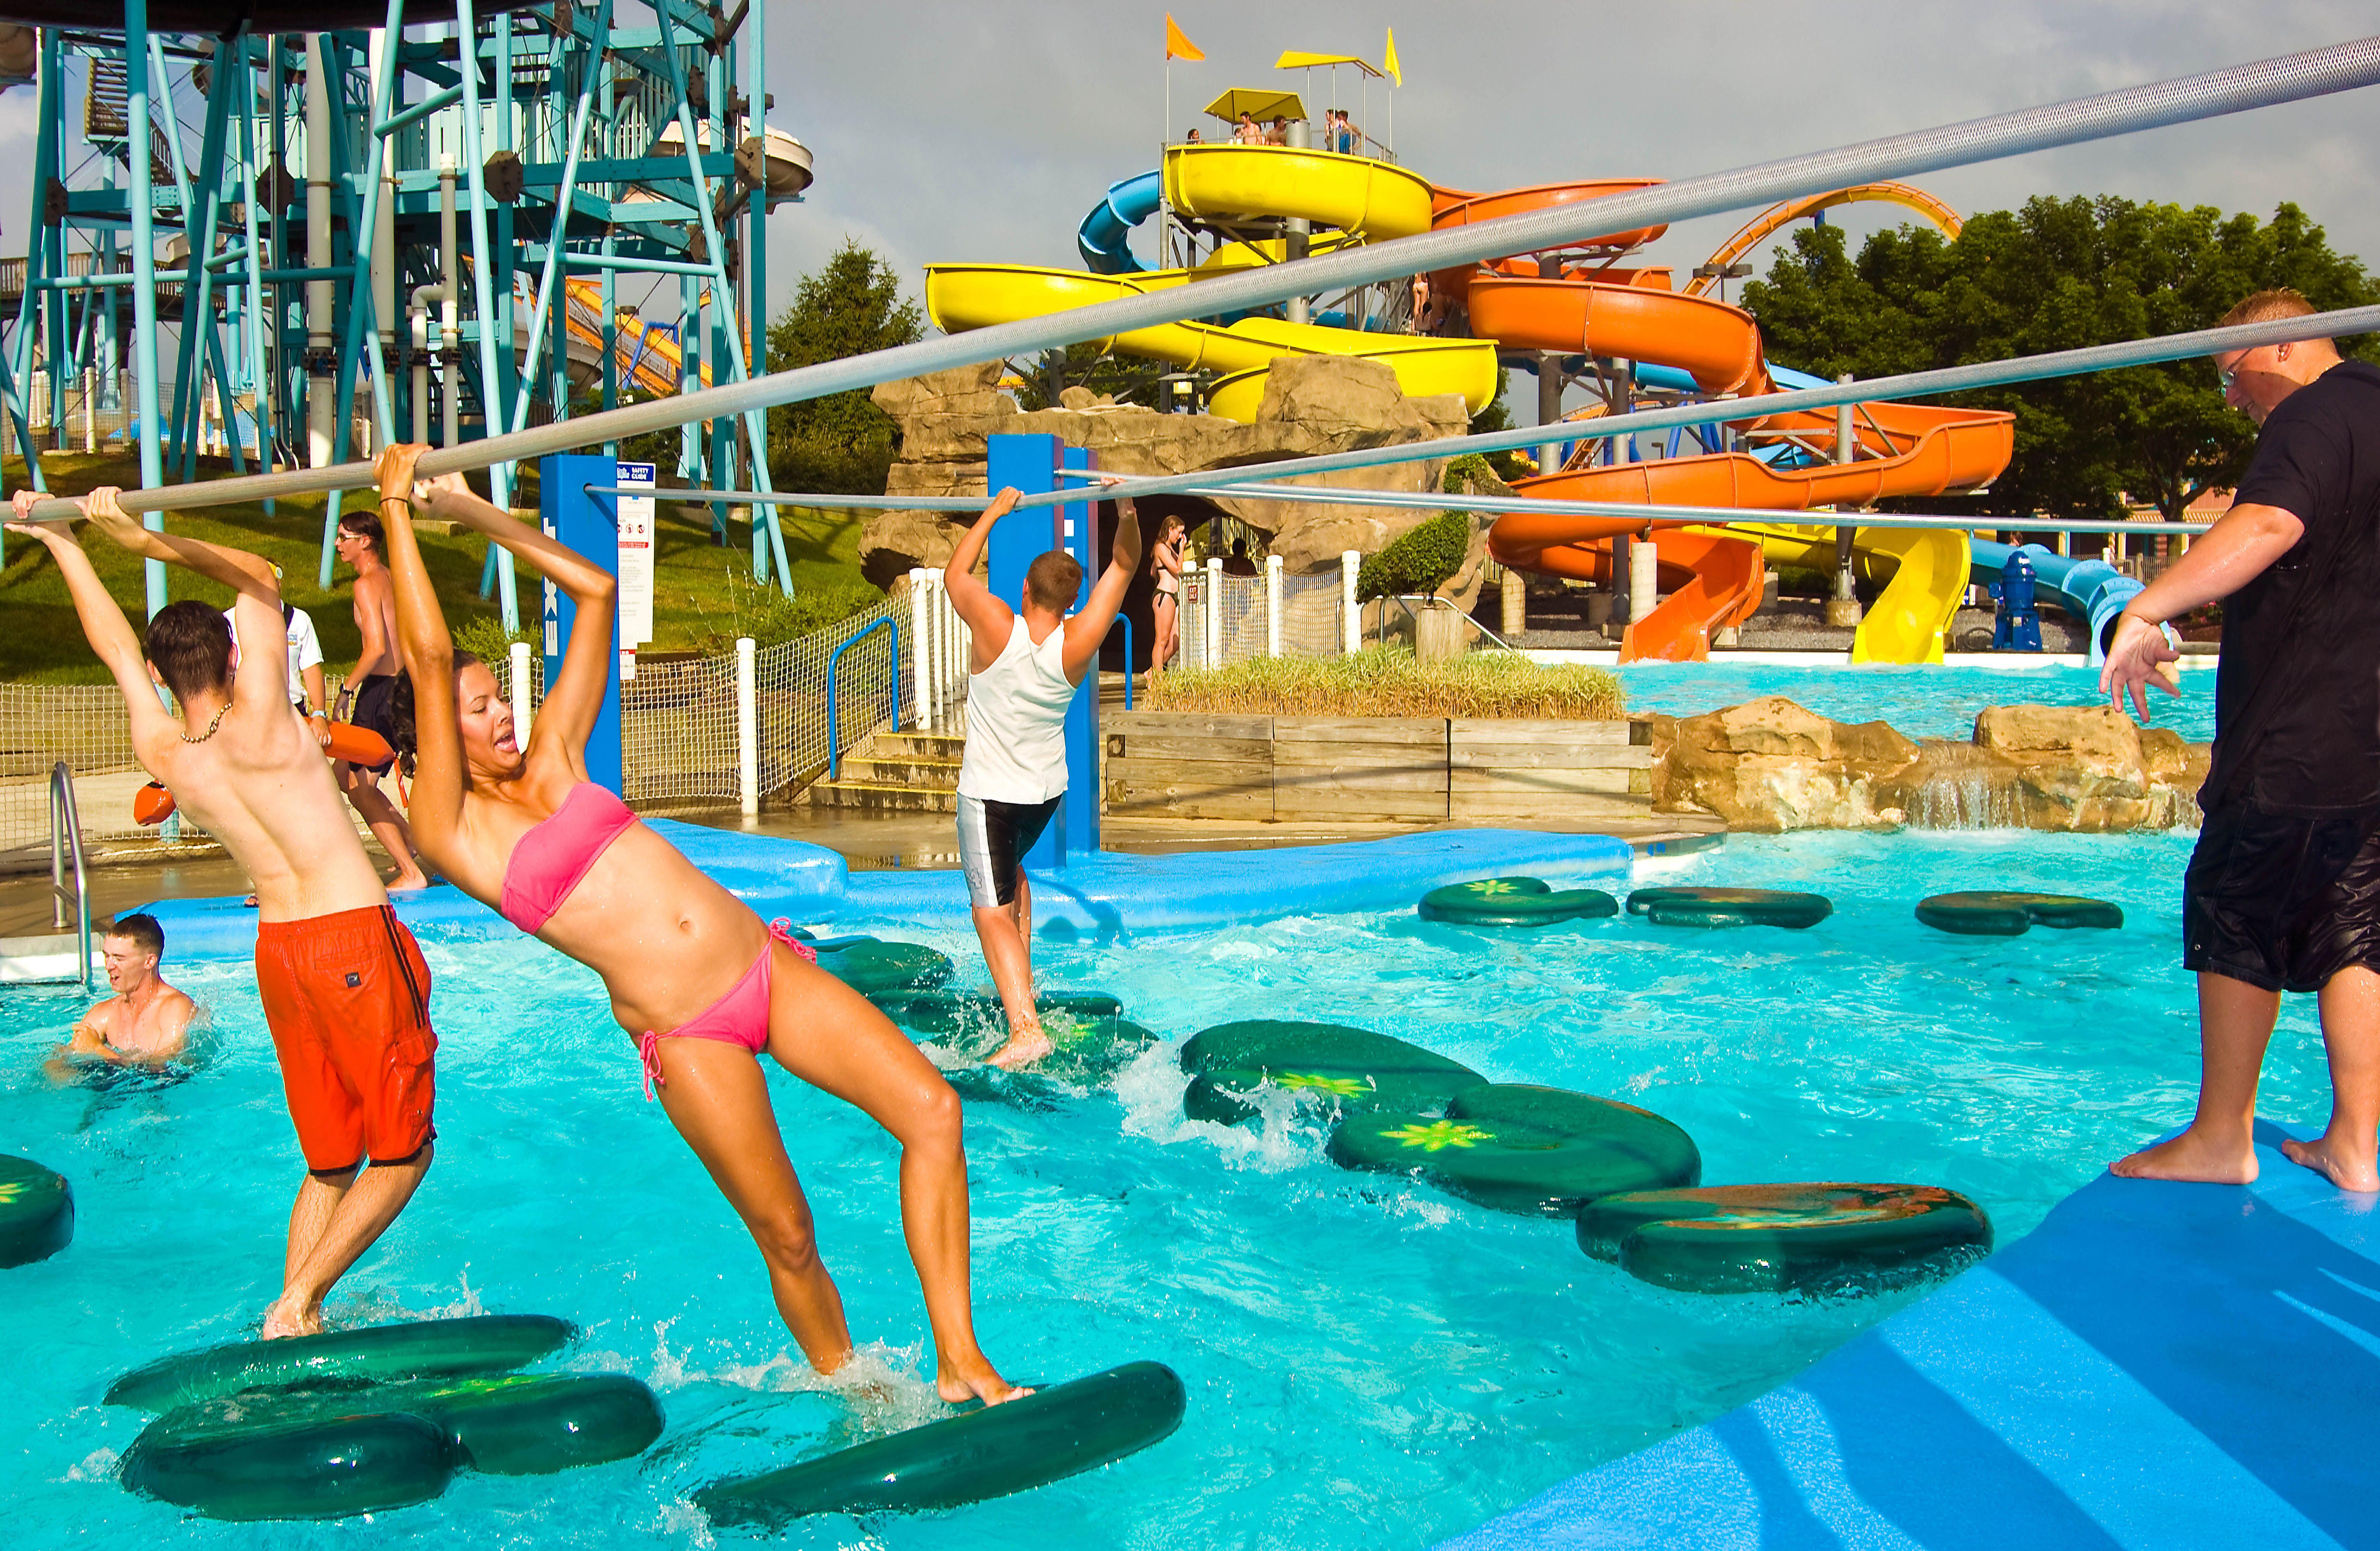 Losing bikini at theme park